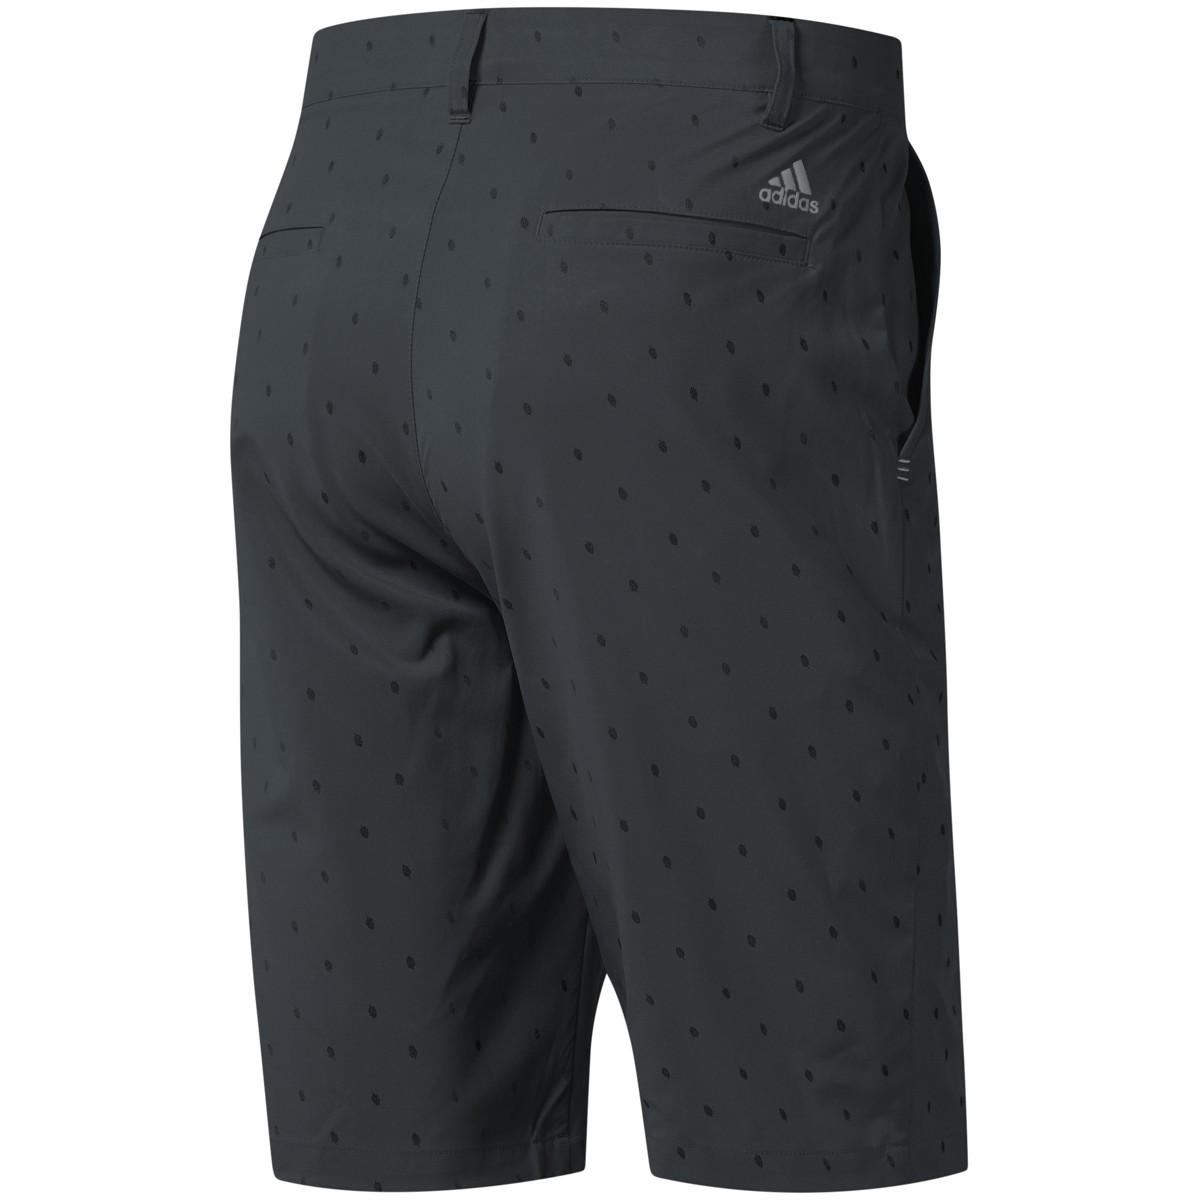 Adidas-Golf-Men-039-s-Ultimate-Print-Shorts-Choose-Size-amp-Color thumbnail 4